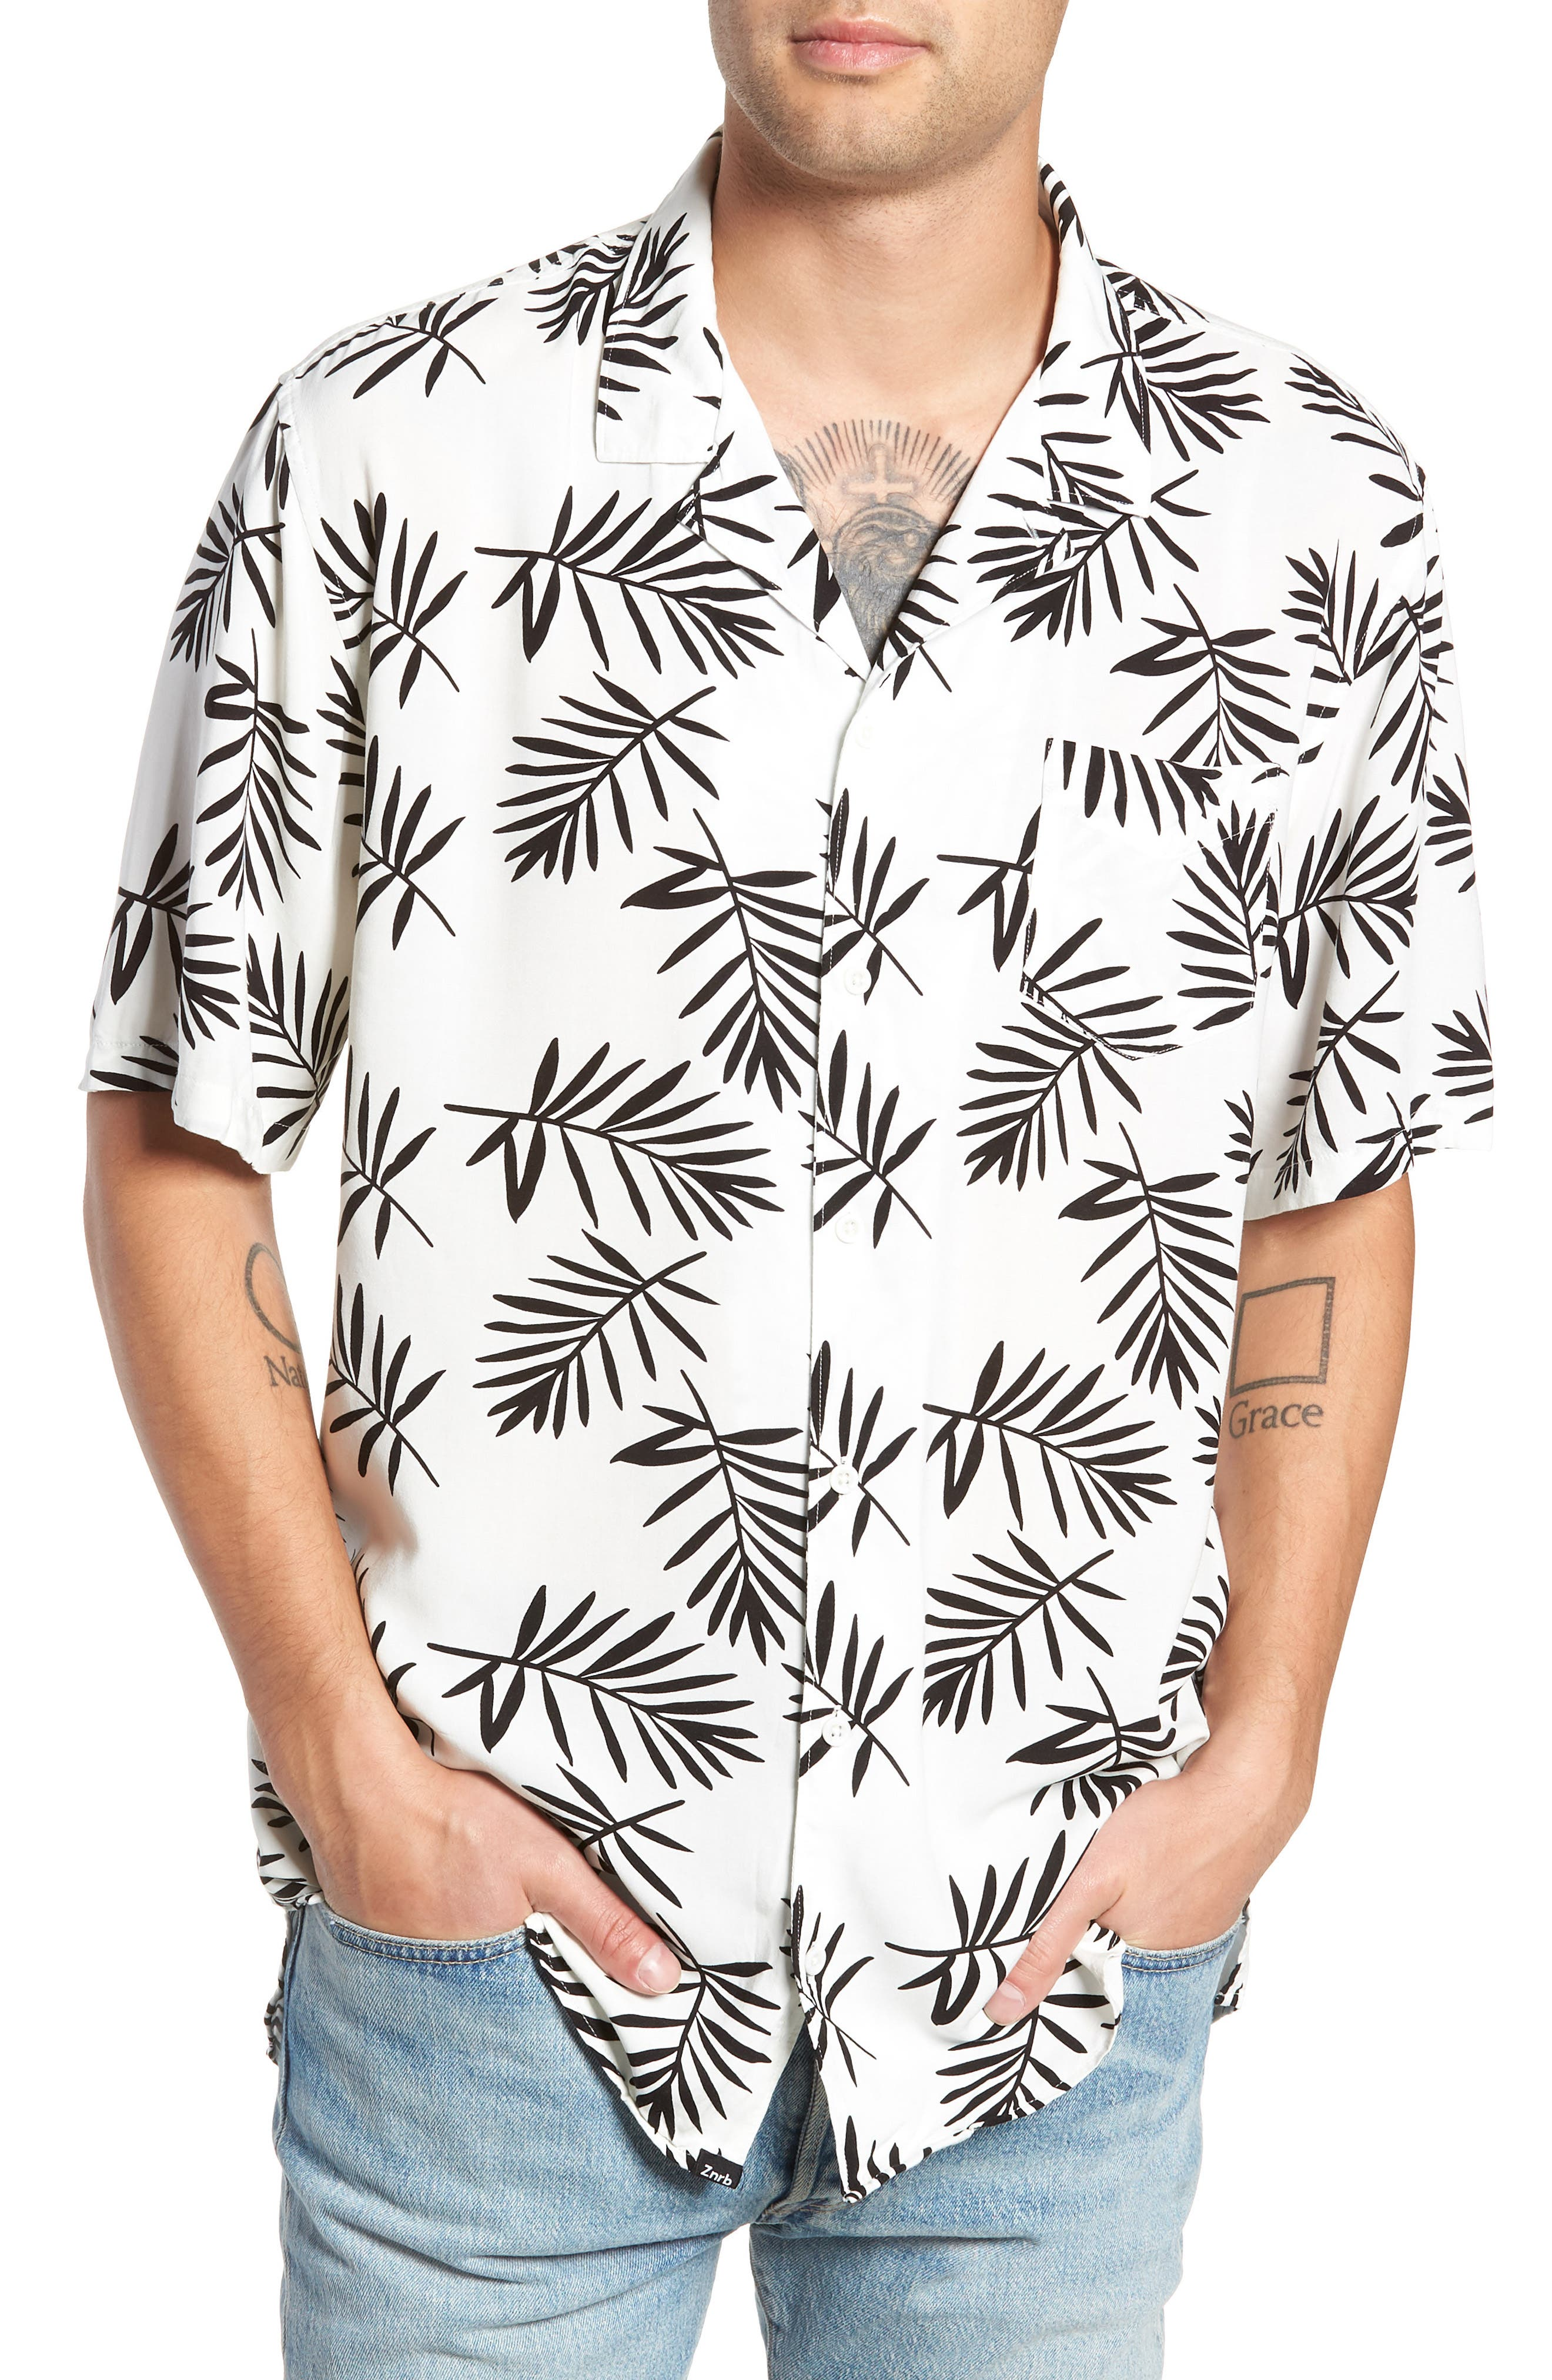 Paradise Short Sleeve Shirt,                         Main,                         color, NAVY